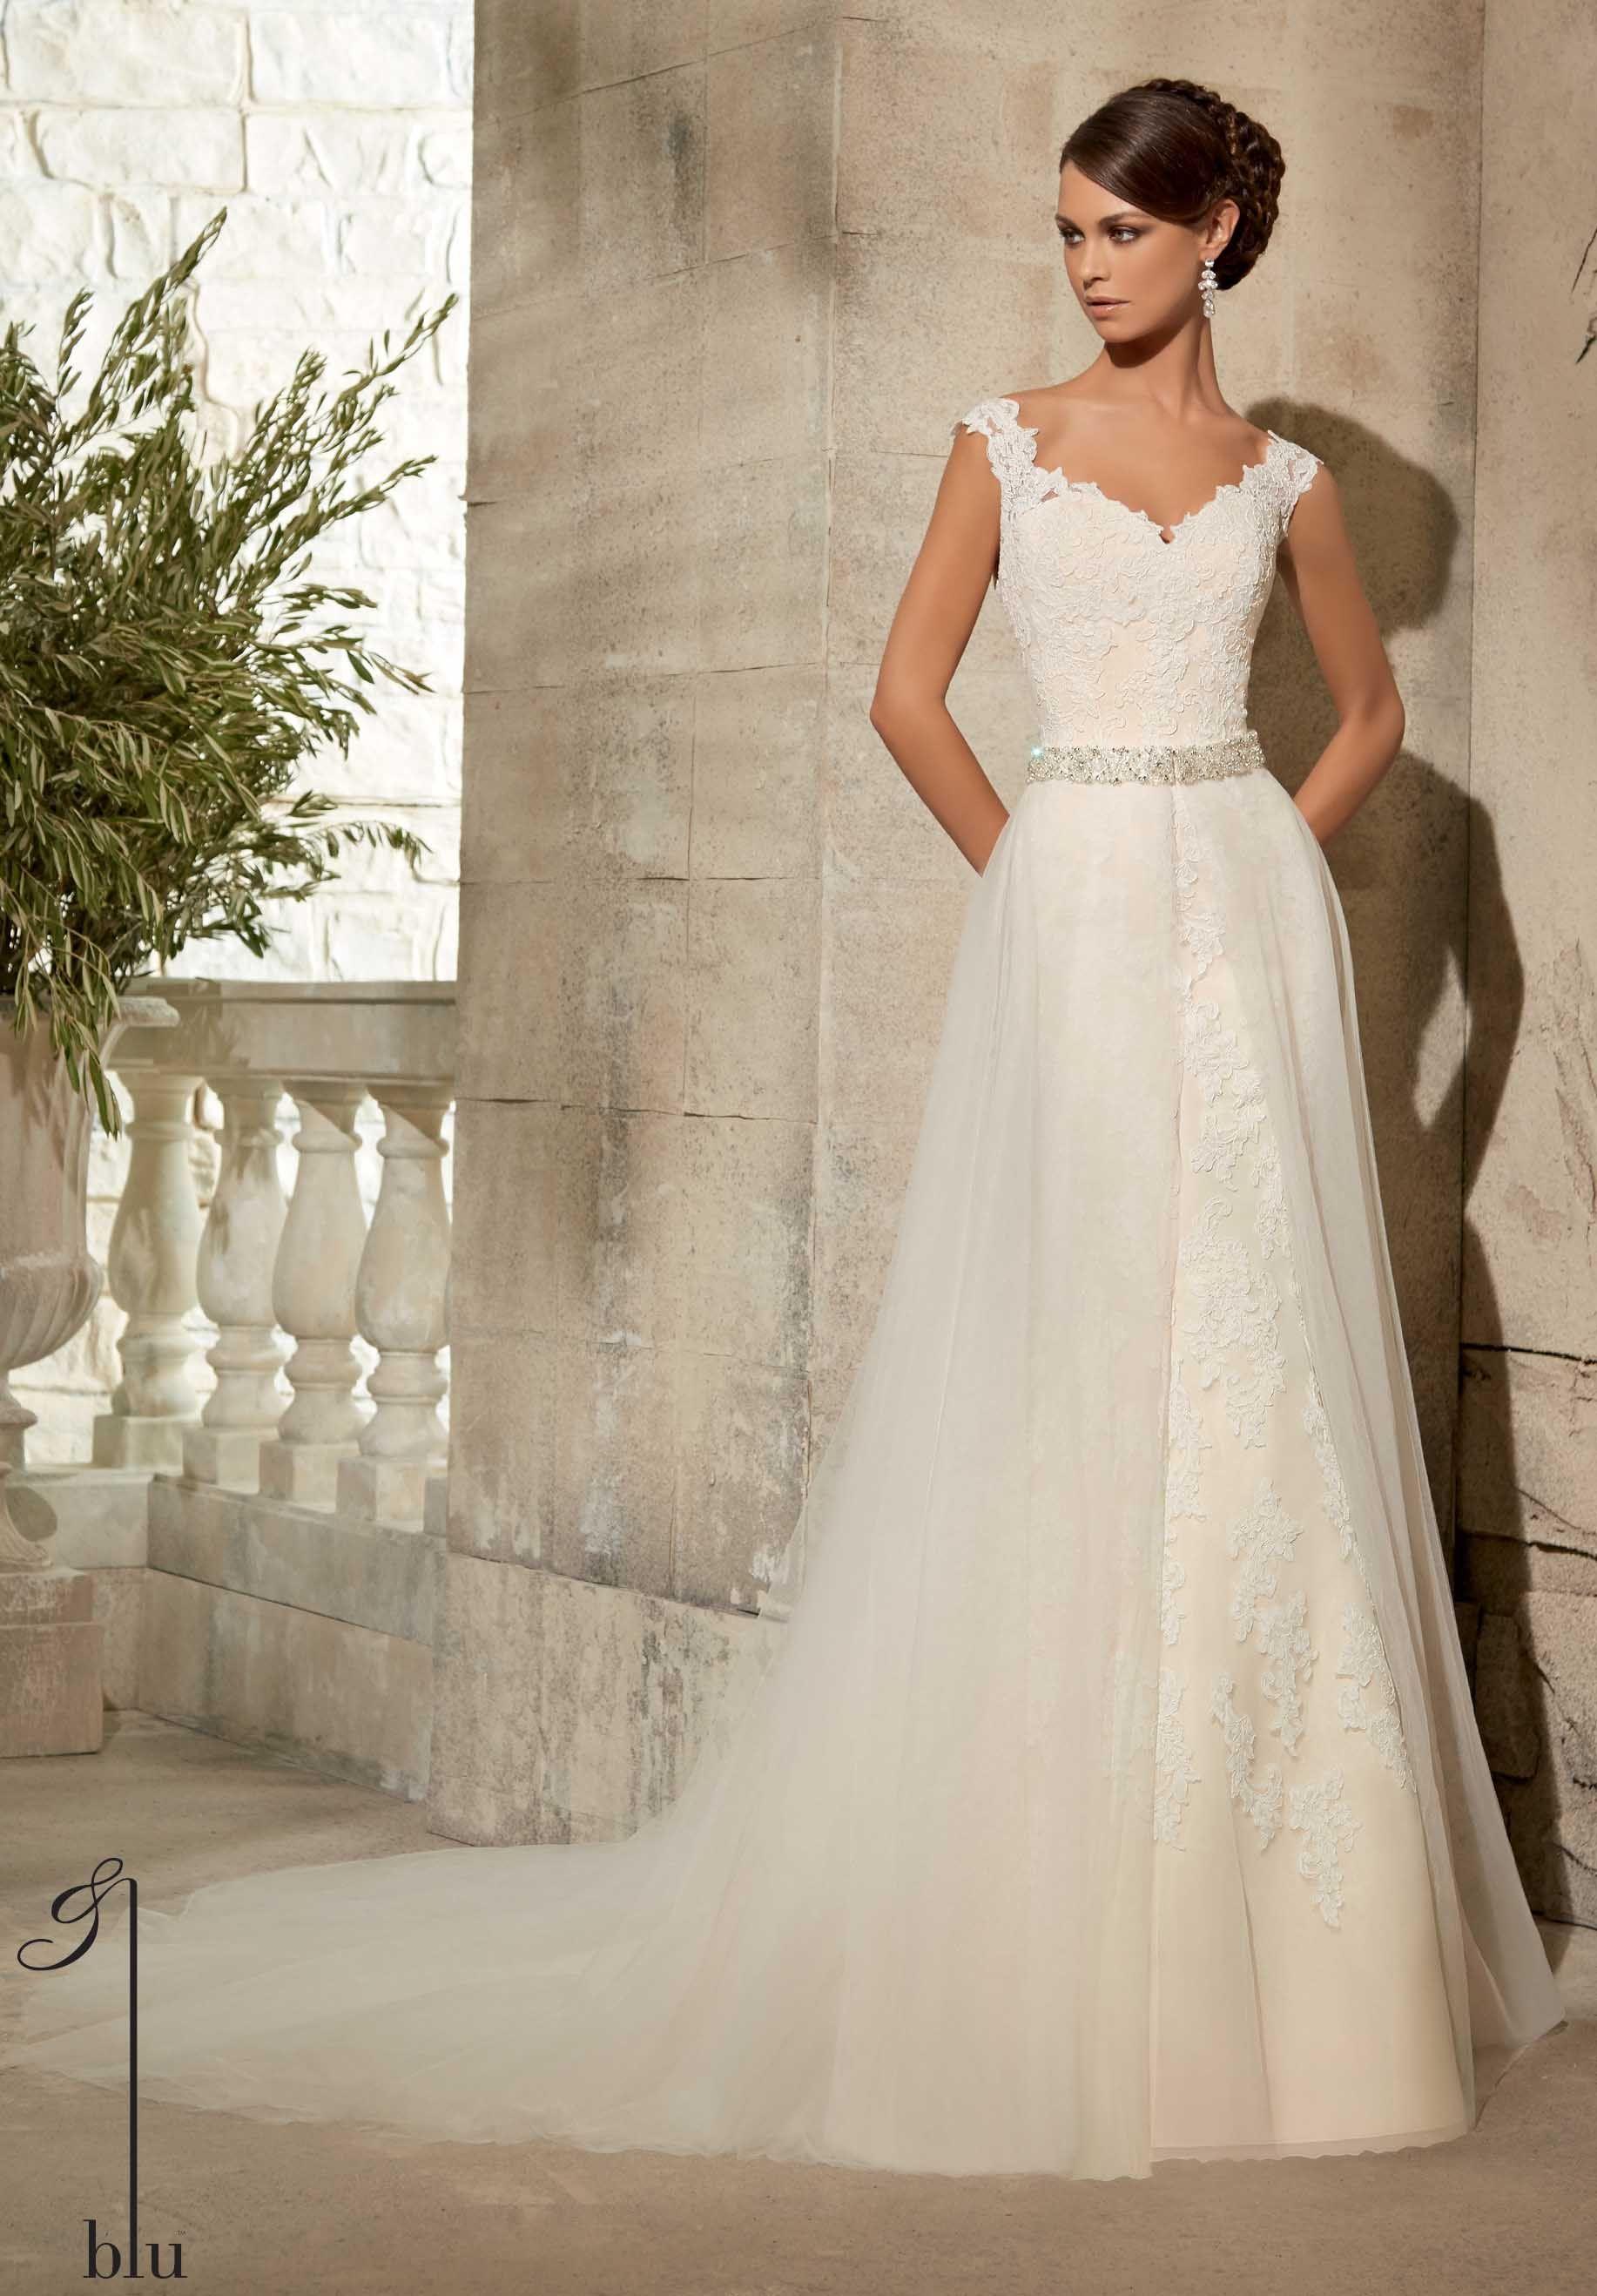 Mori lee blu wedding dresses style velem pinterest